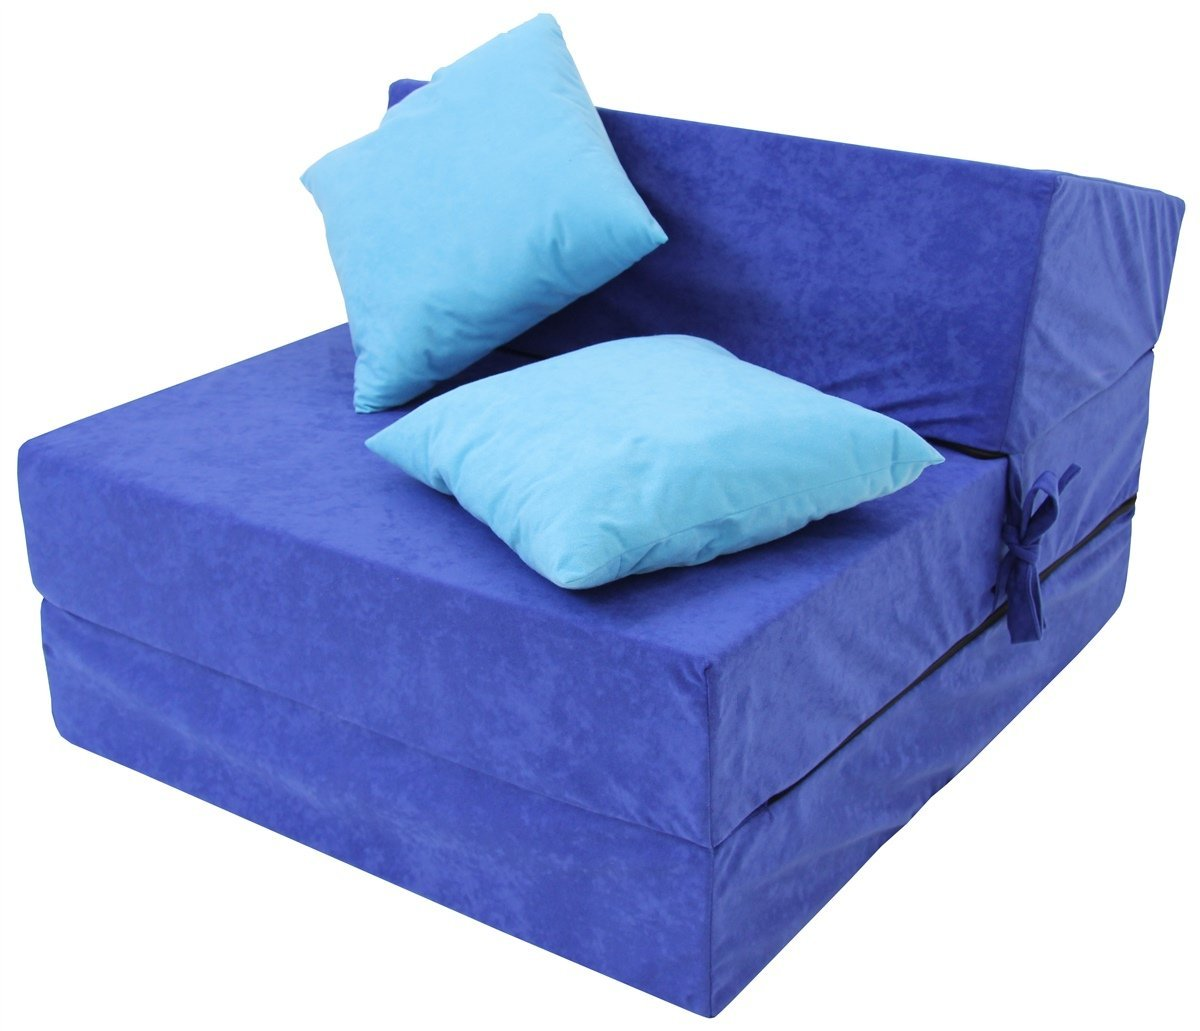 schlafsessel klappmatratze faltmatratze gästebett bettsessel ... - Bettsessel Kinderzimmer Gastebett